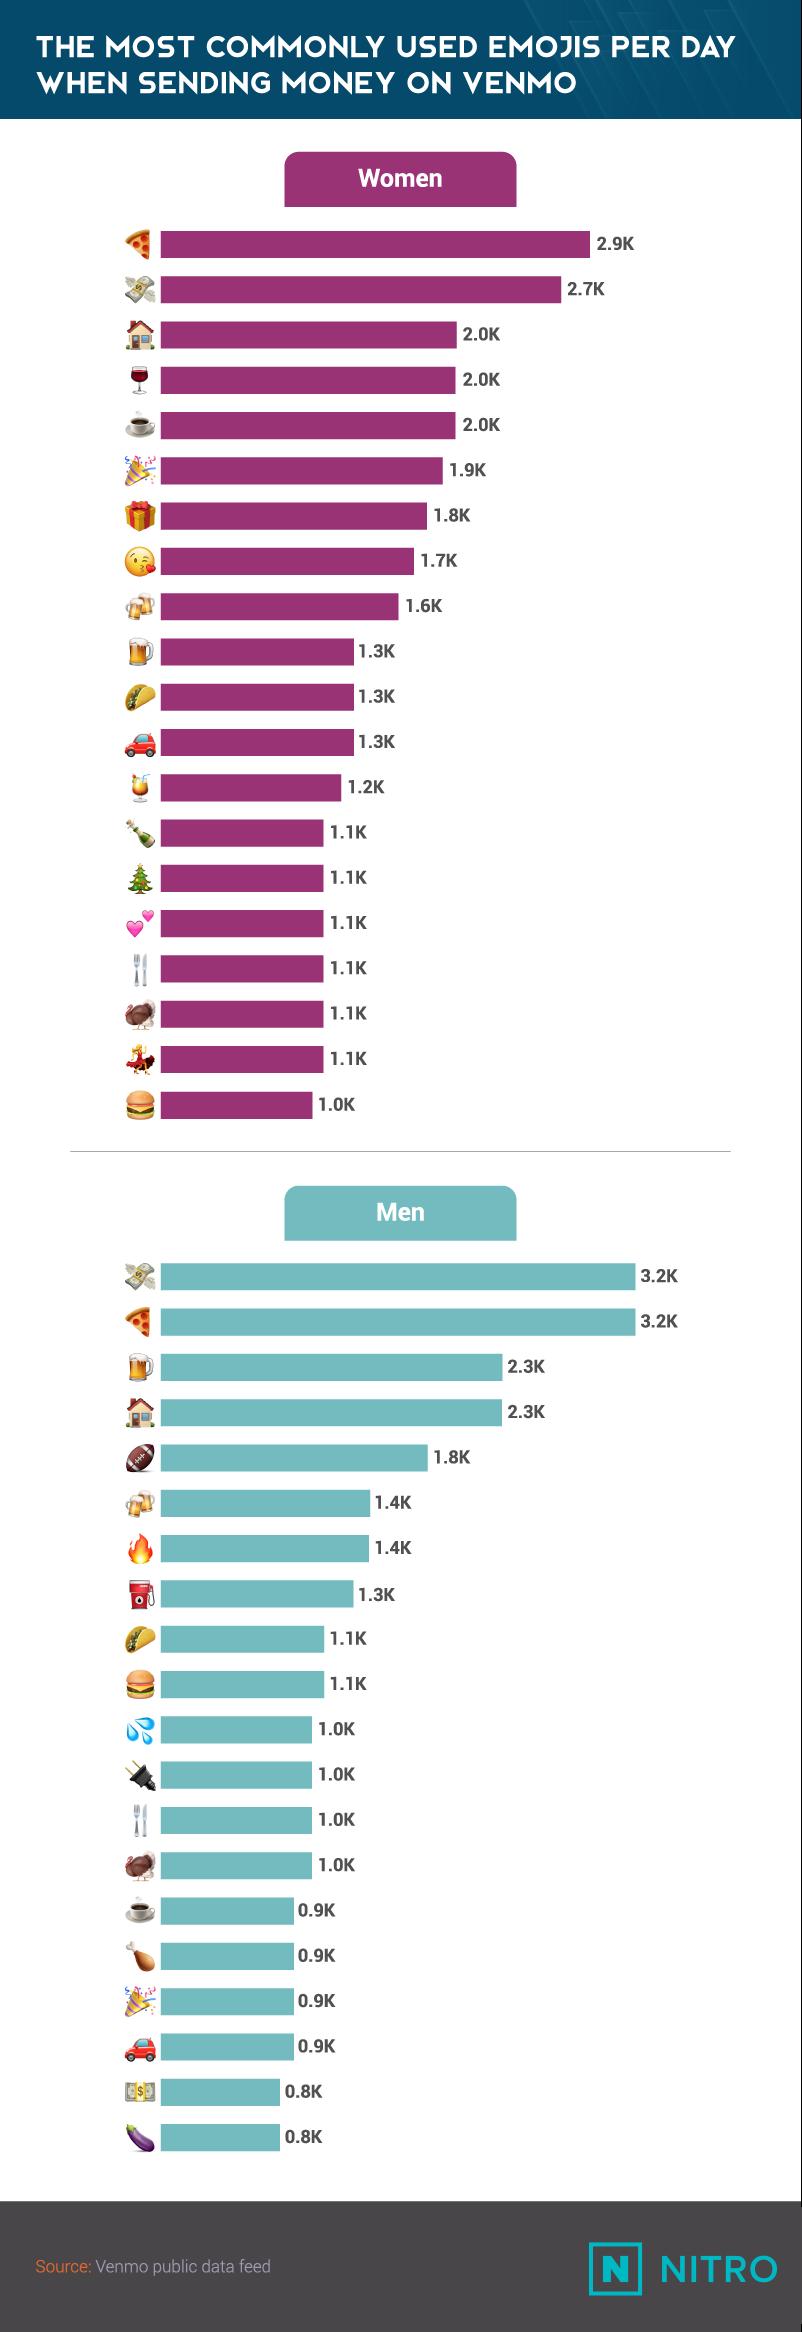 Venmo Emojis_The Most Commonly Used Emojis Per Day When Sending Money-NITRO